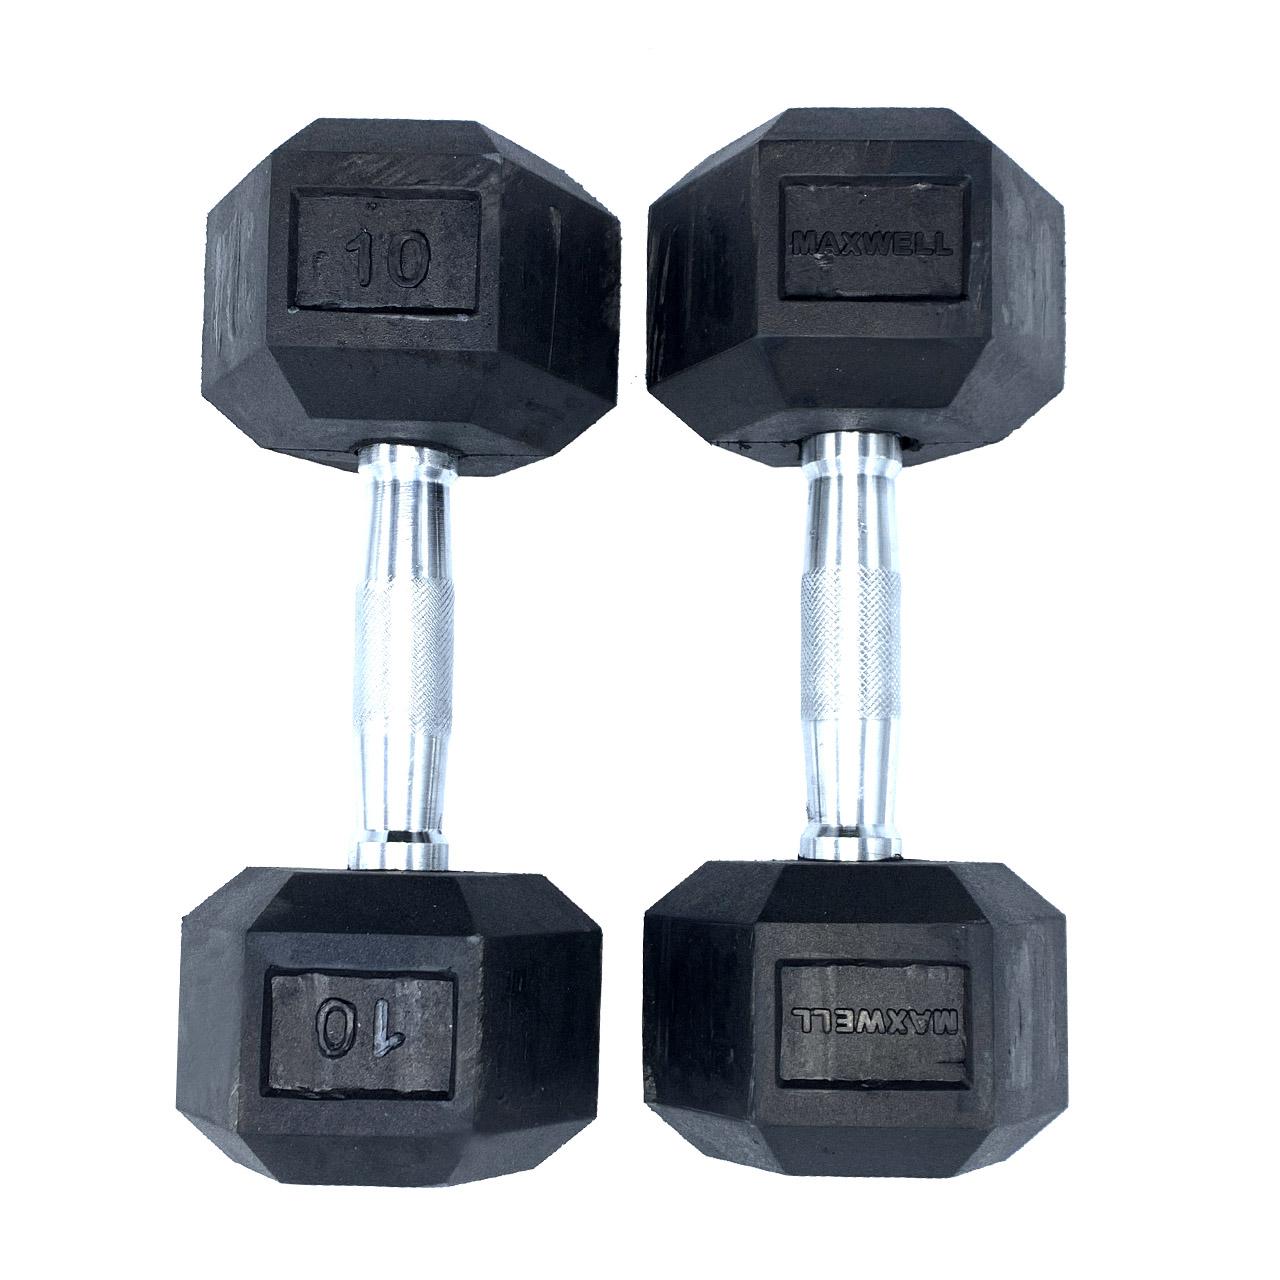 دمبل مکسول کد MX10 وزن 10 کیلوگرم بسته ۲ عددی